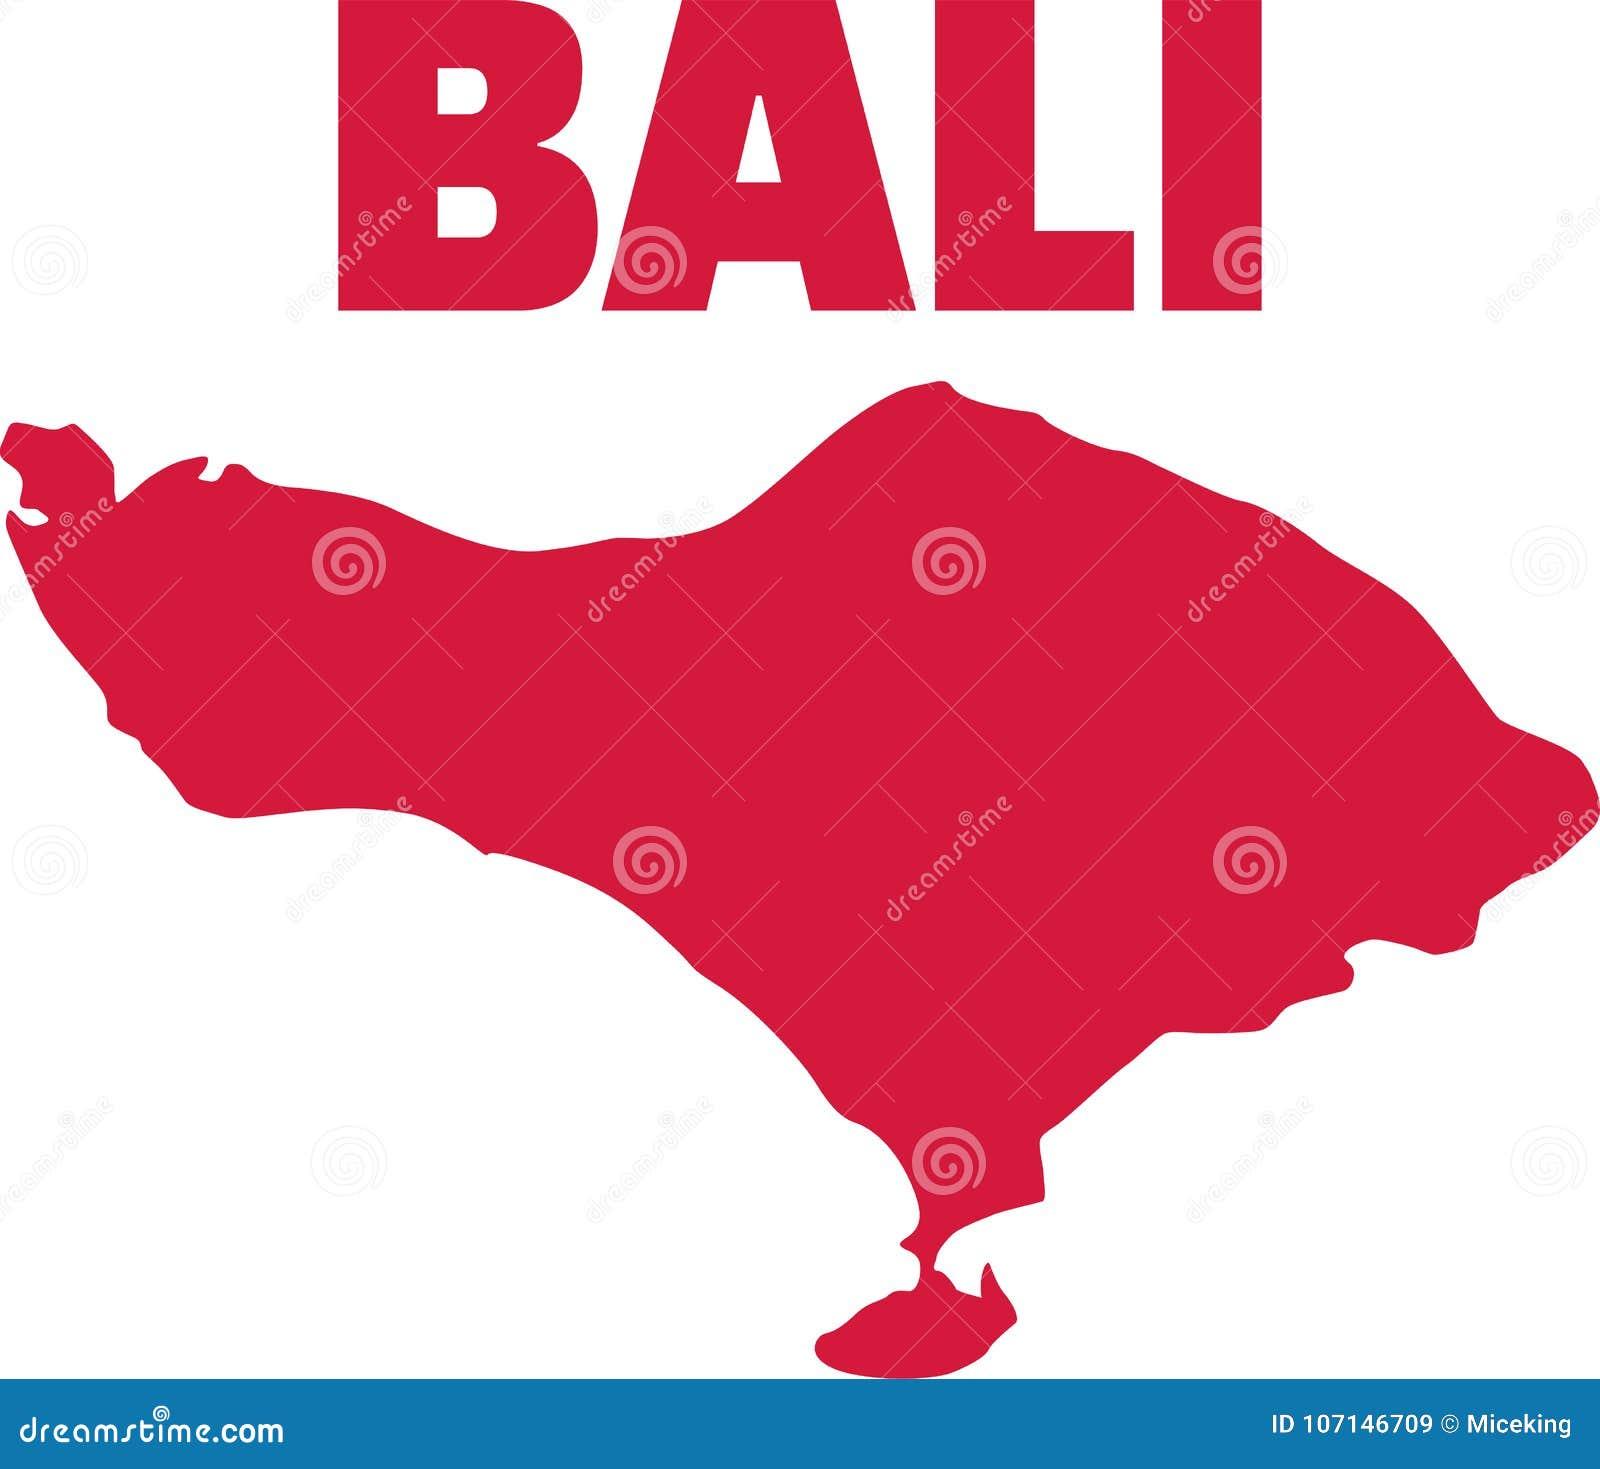 Bali Map Island Stock Vector Illustration Of Island 107146709